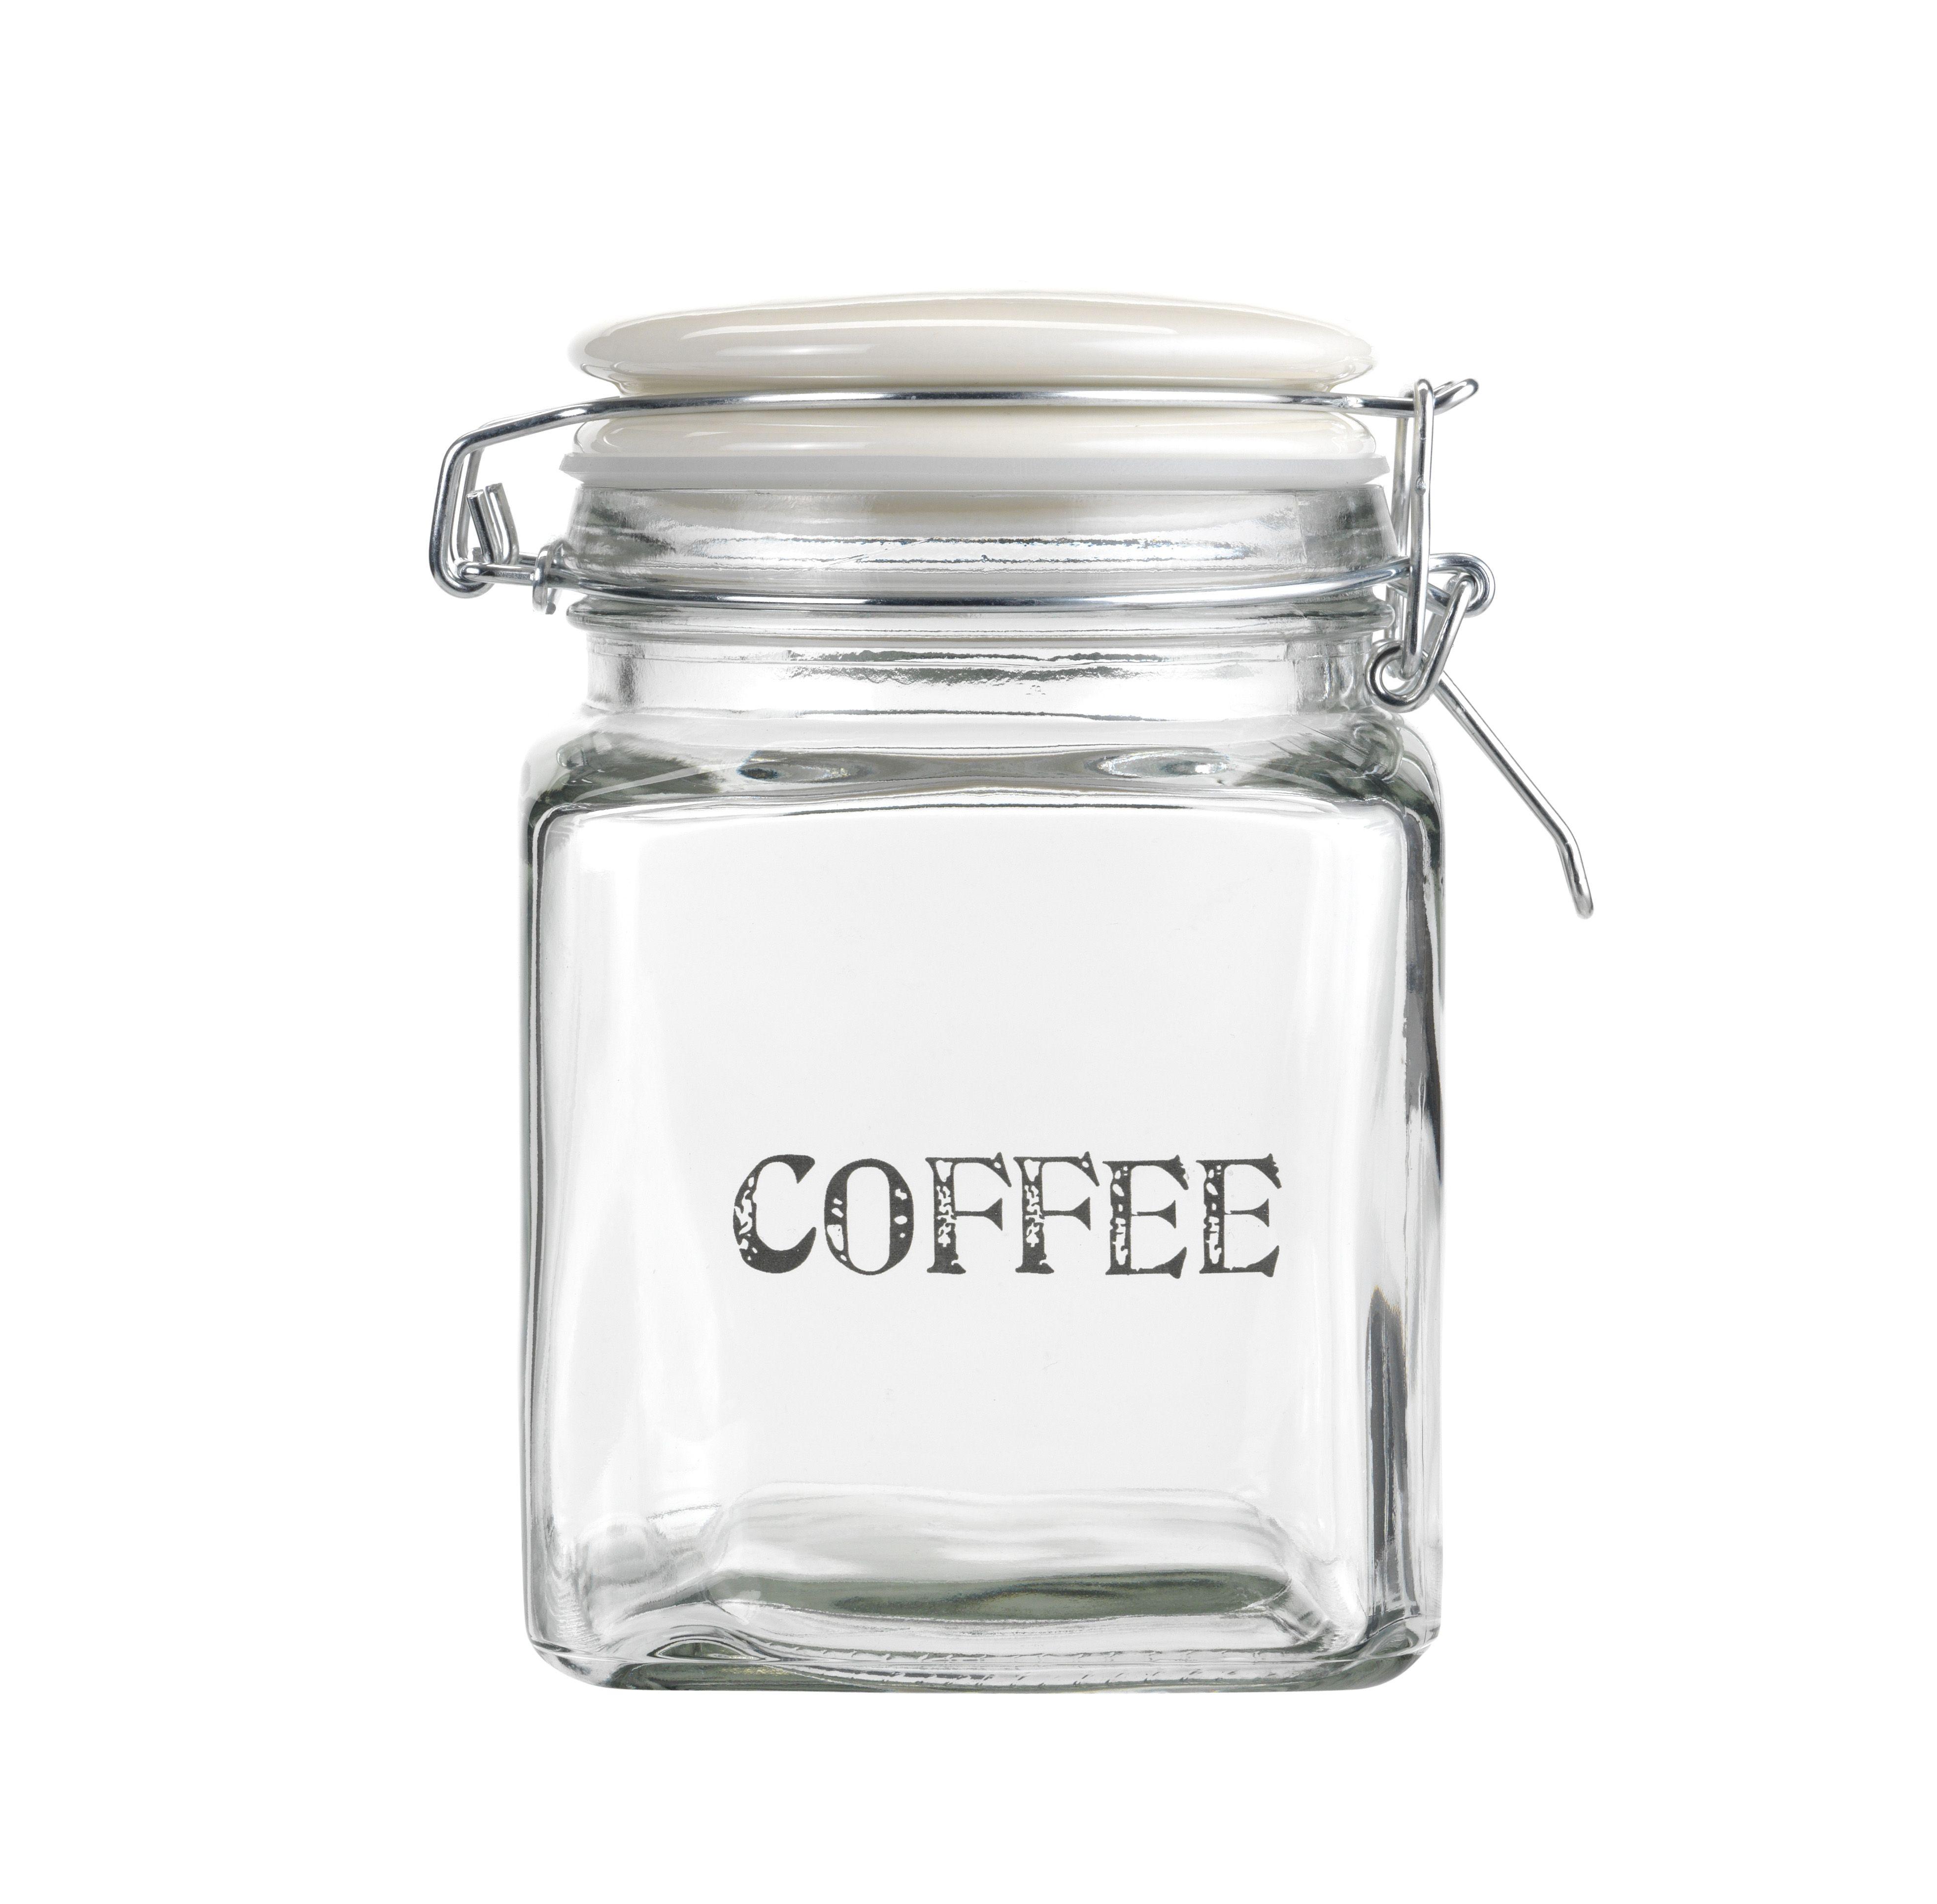 Give your coffee a new home Glass Coffee Storage Jar £6